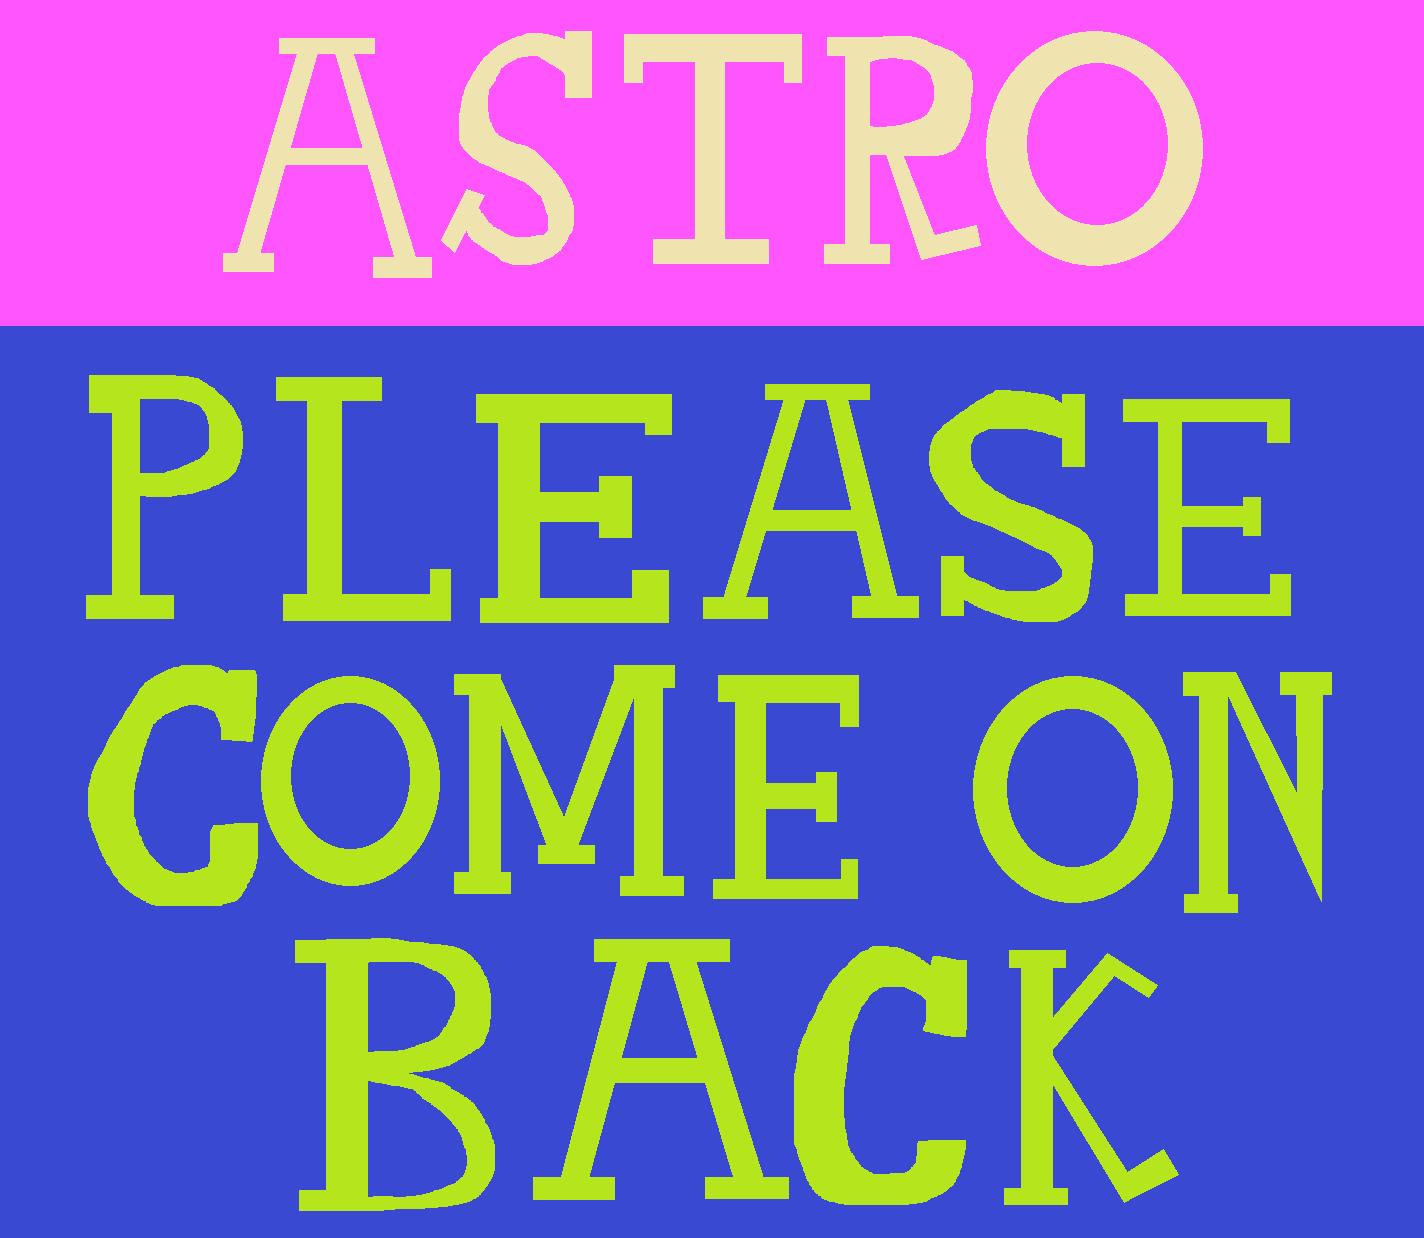 Astro, Please Come on Back